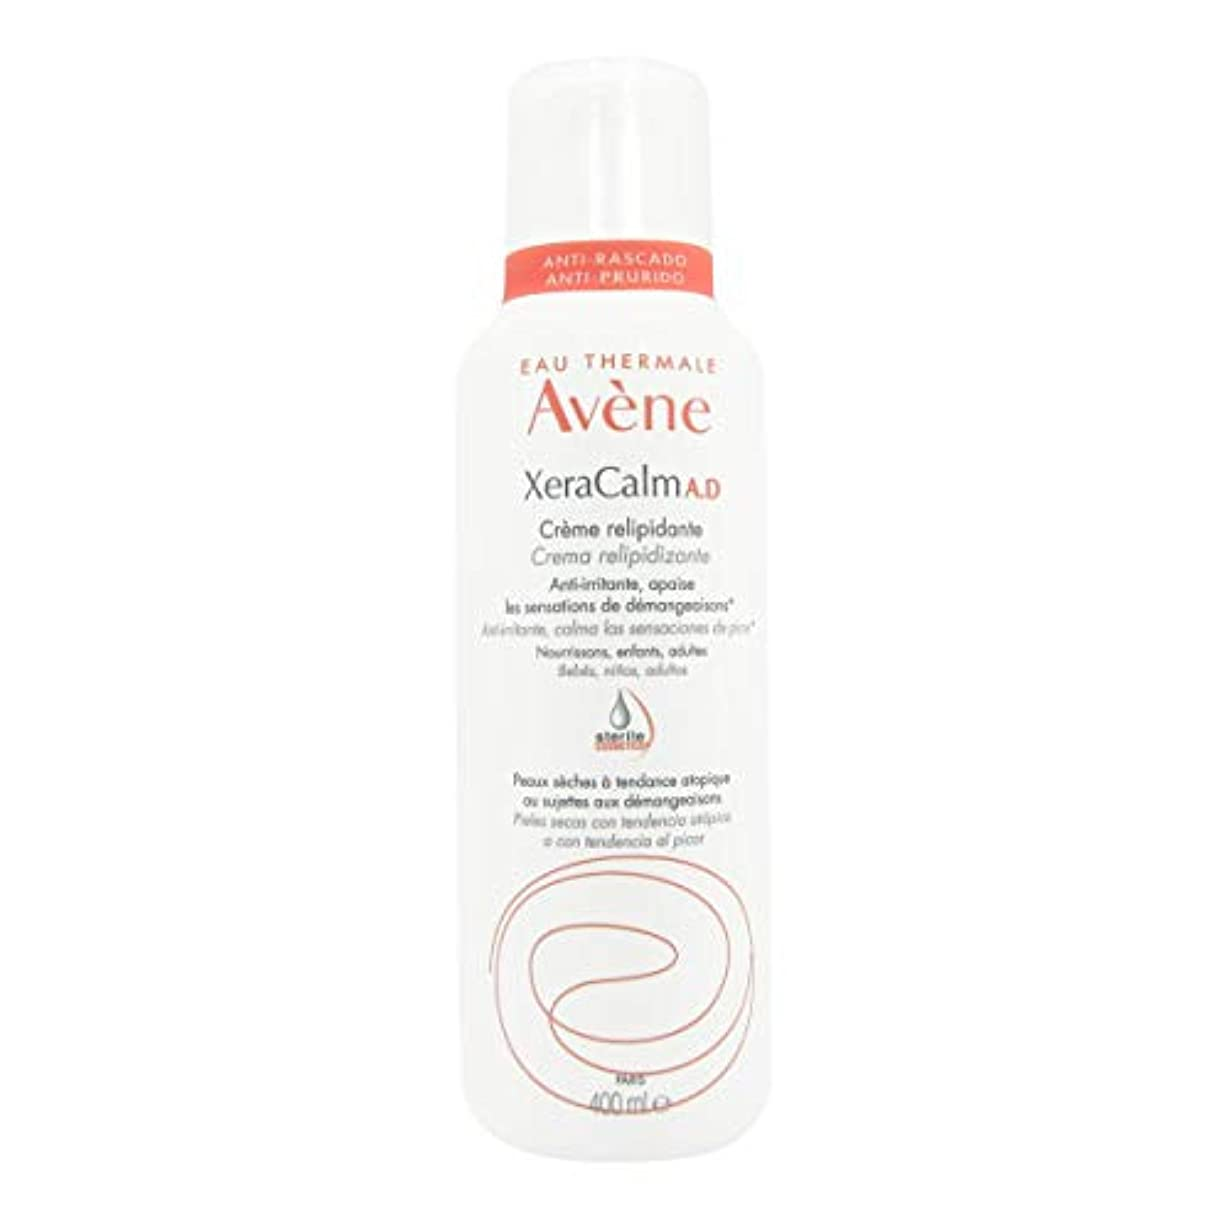 件名症候群縁石Avene Xeracalm Ad Replenishing Cream 400ml [並行輸入品]